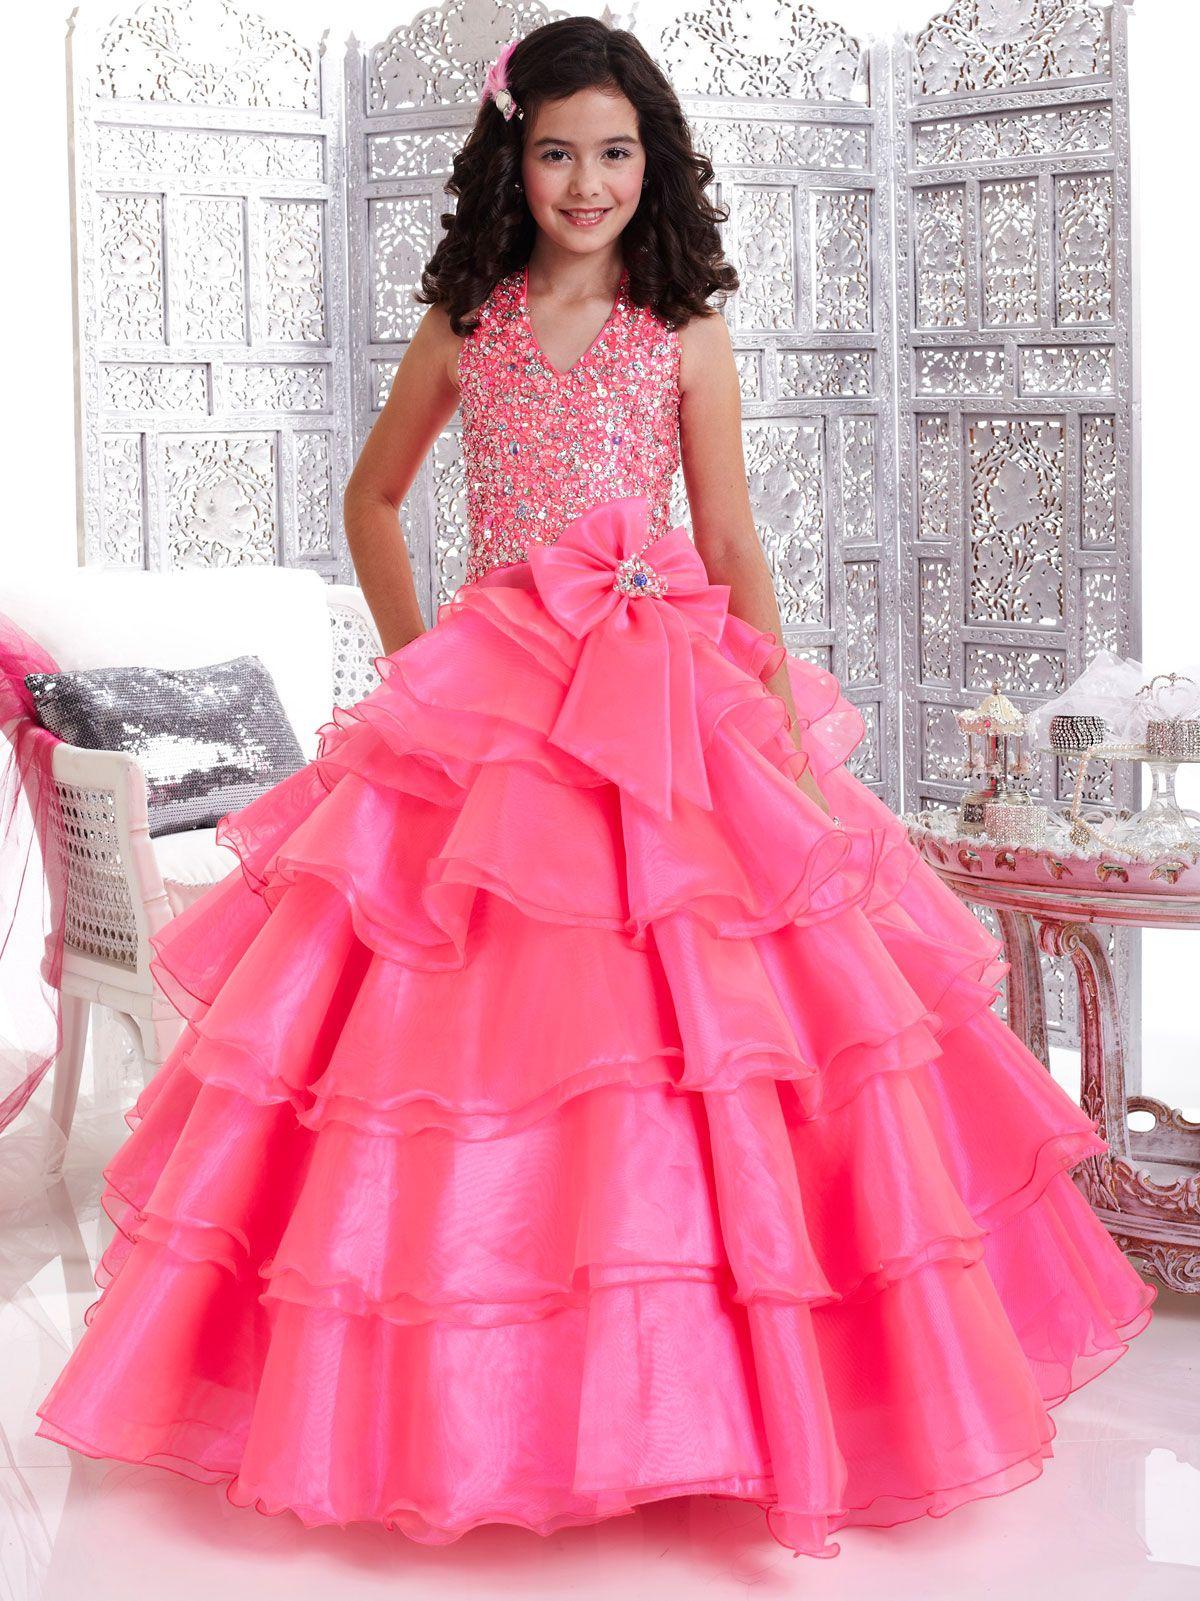 Stunning Tiffany Glitz Children Pageant Dress 33428. This organza ...